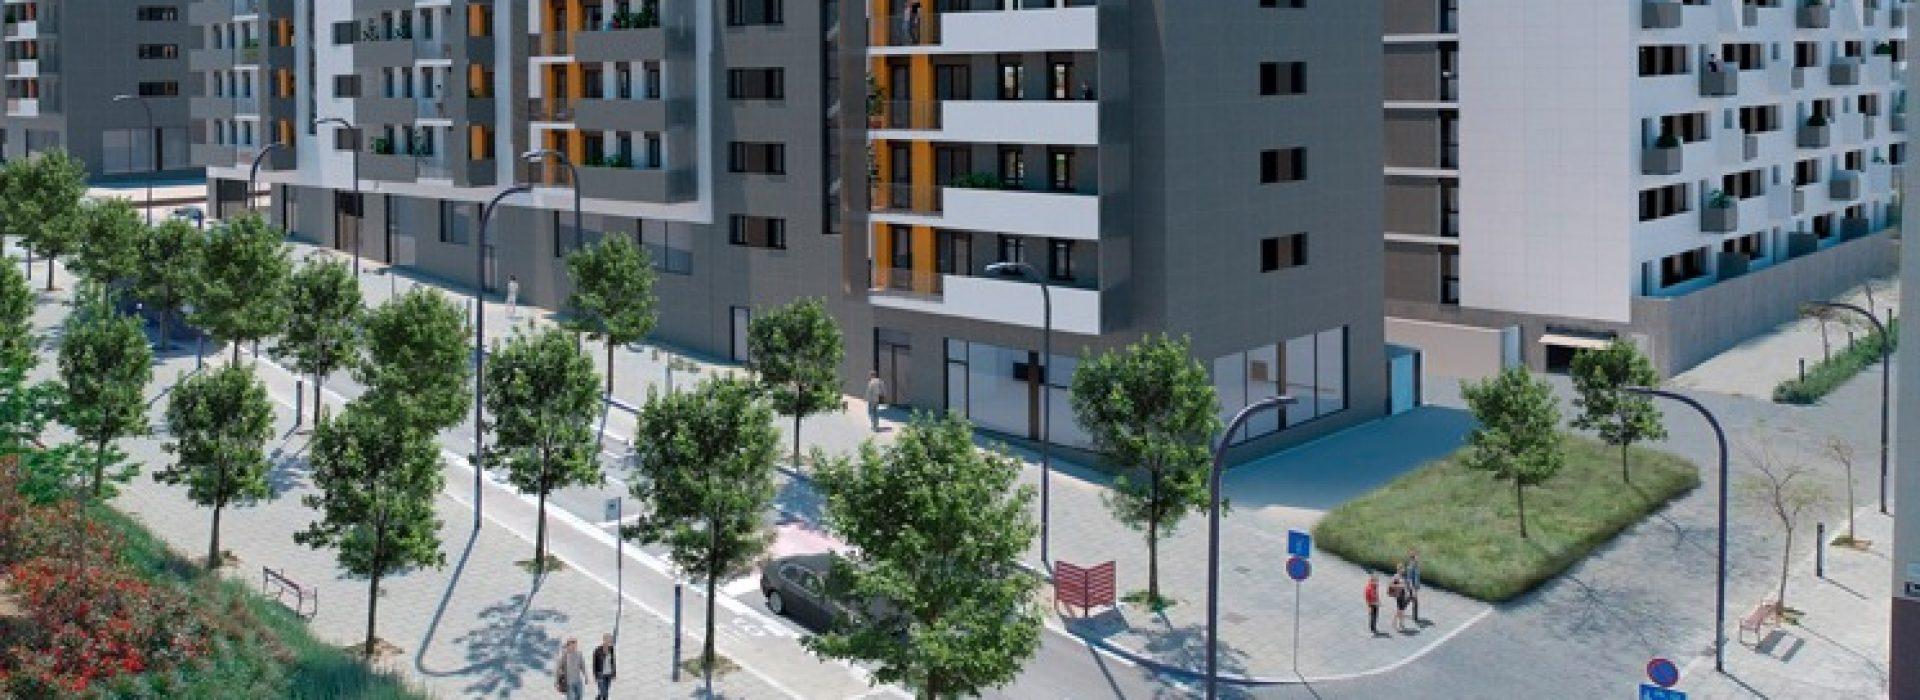 residencial-mas-llui-parc01